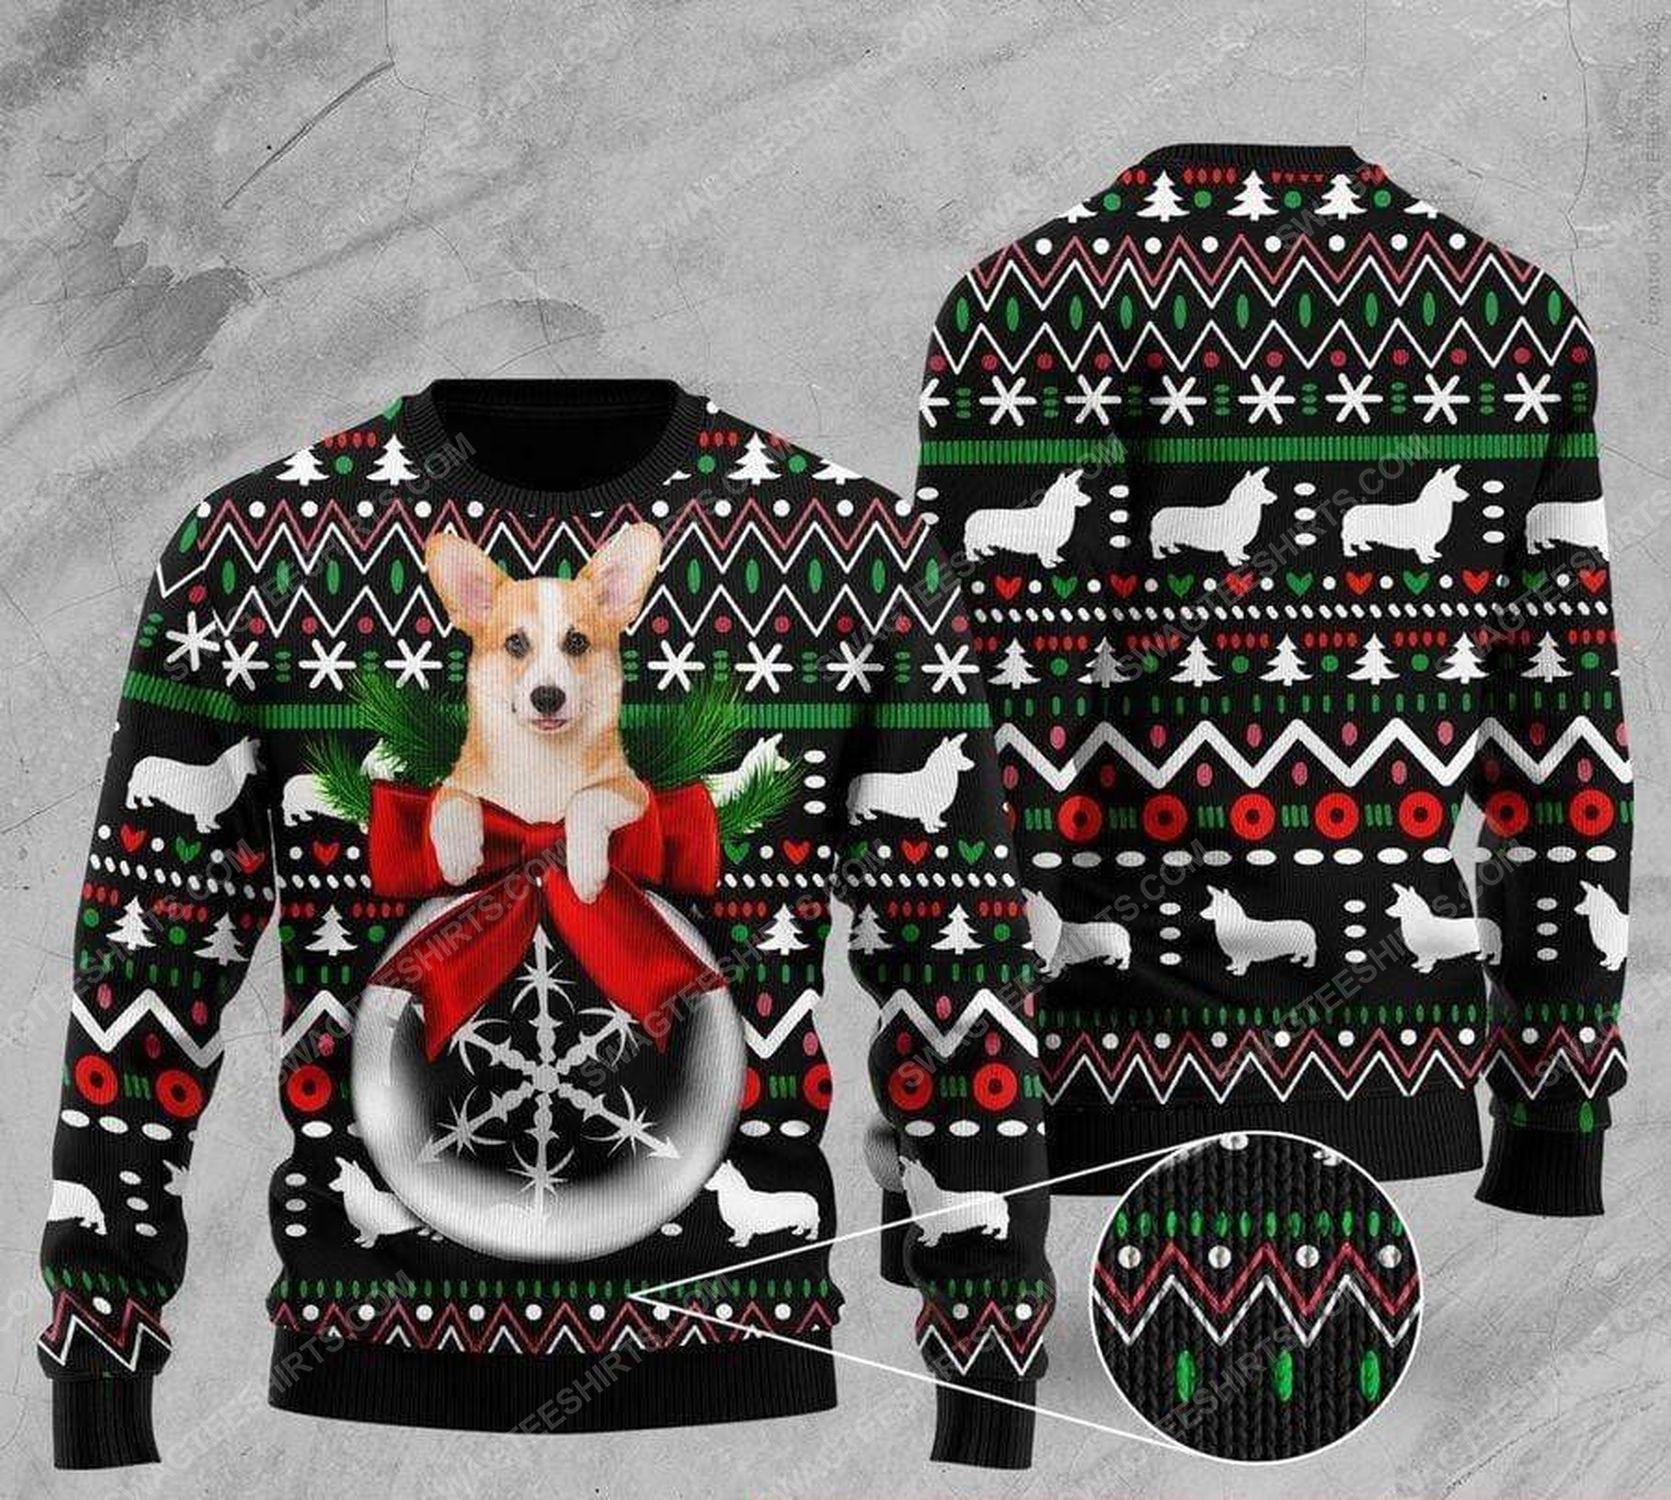 Corgi and wreath all over print ugly christmas sweater 1 - Copy - Copy